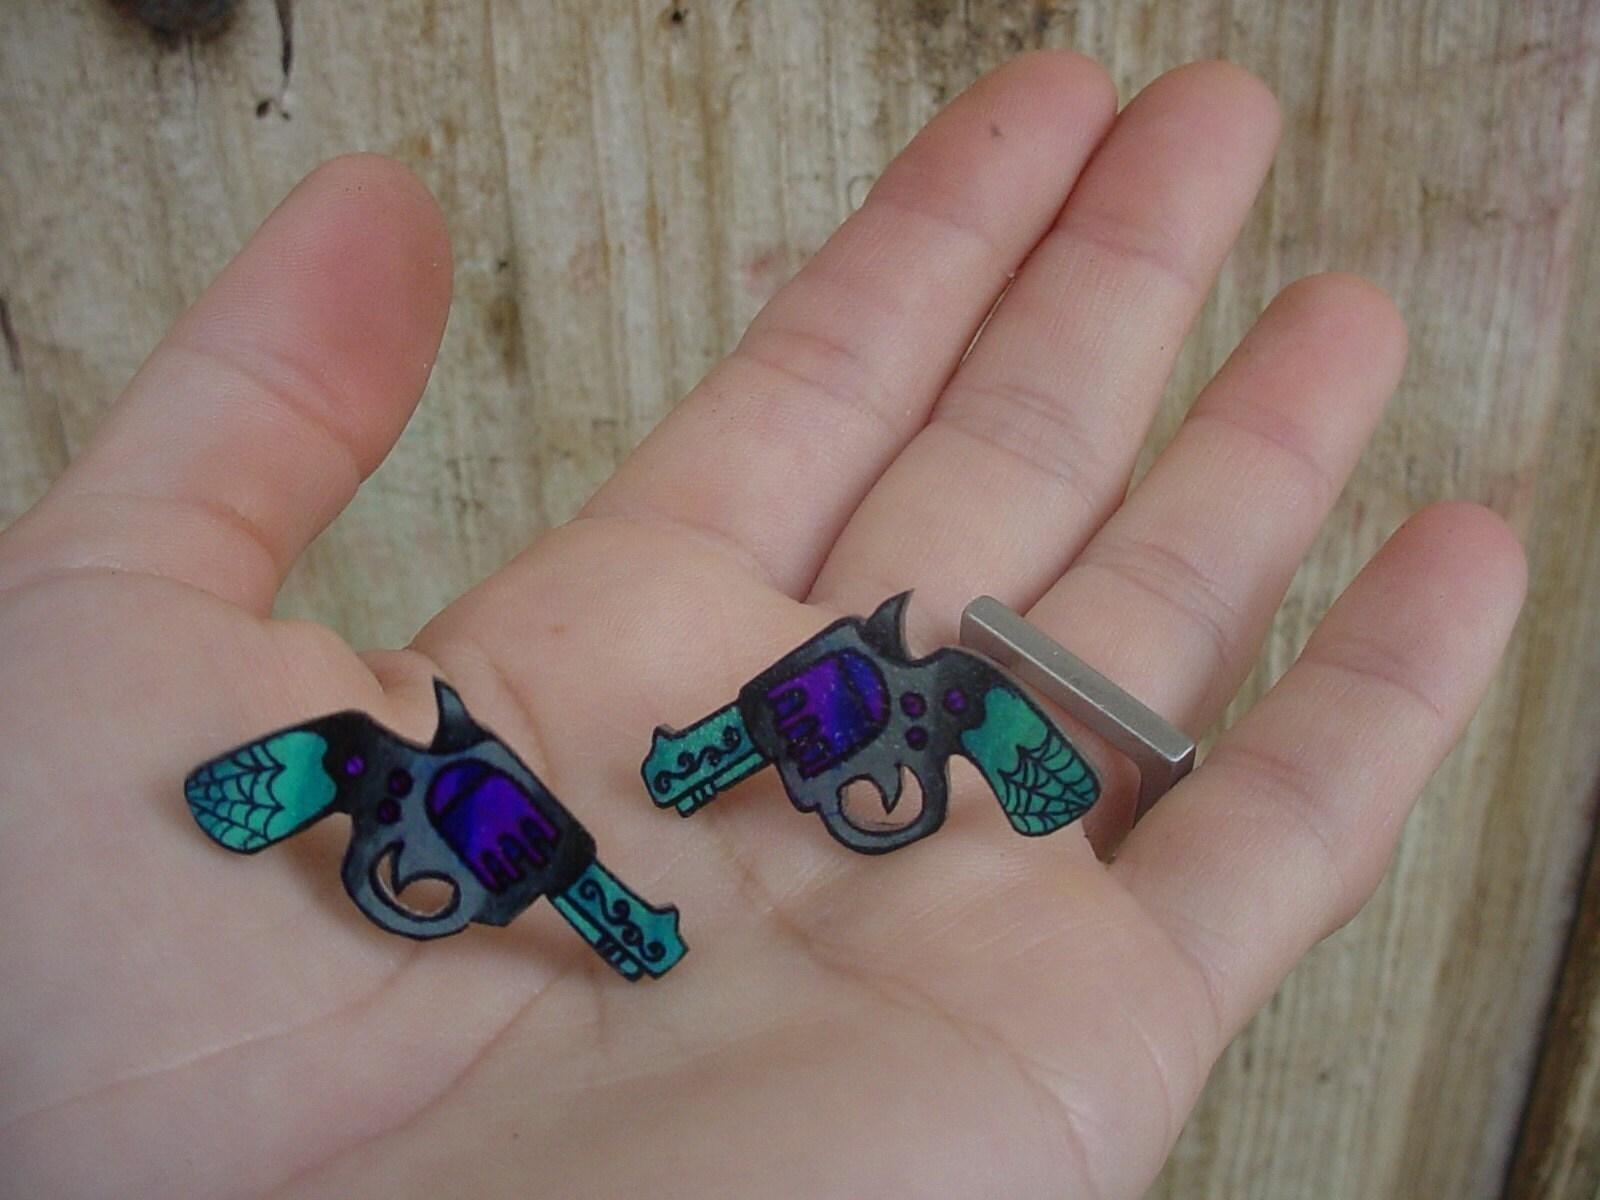 sweet little purple and teal tattoo pistol (nickel free) ear studs/posts